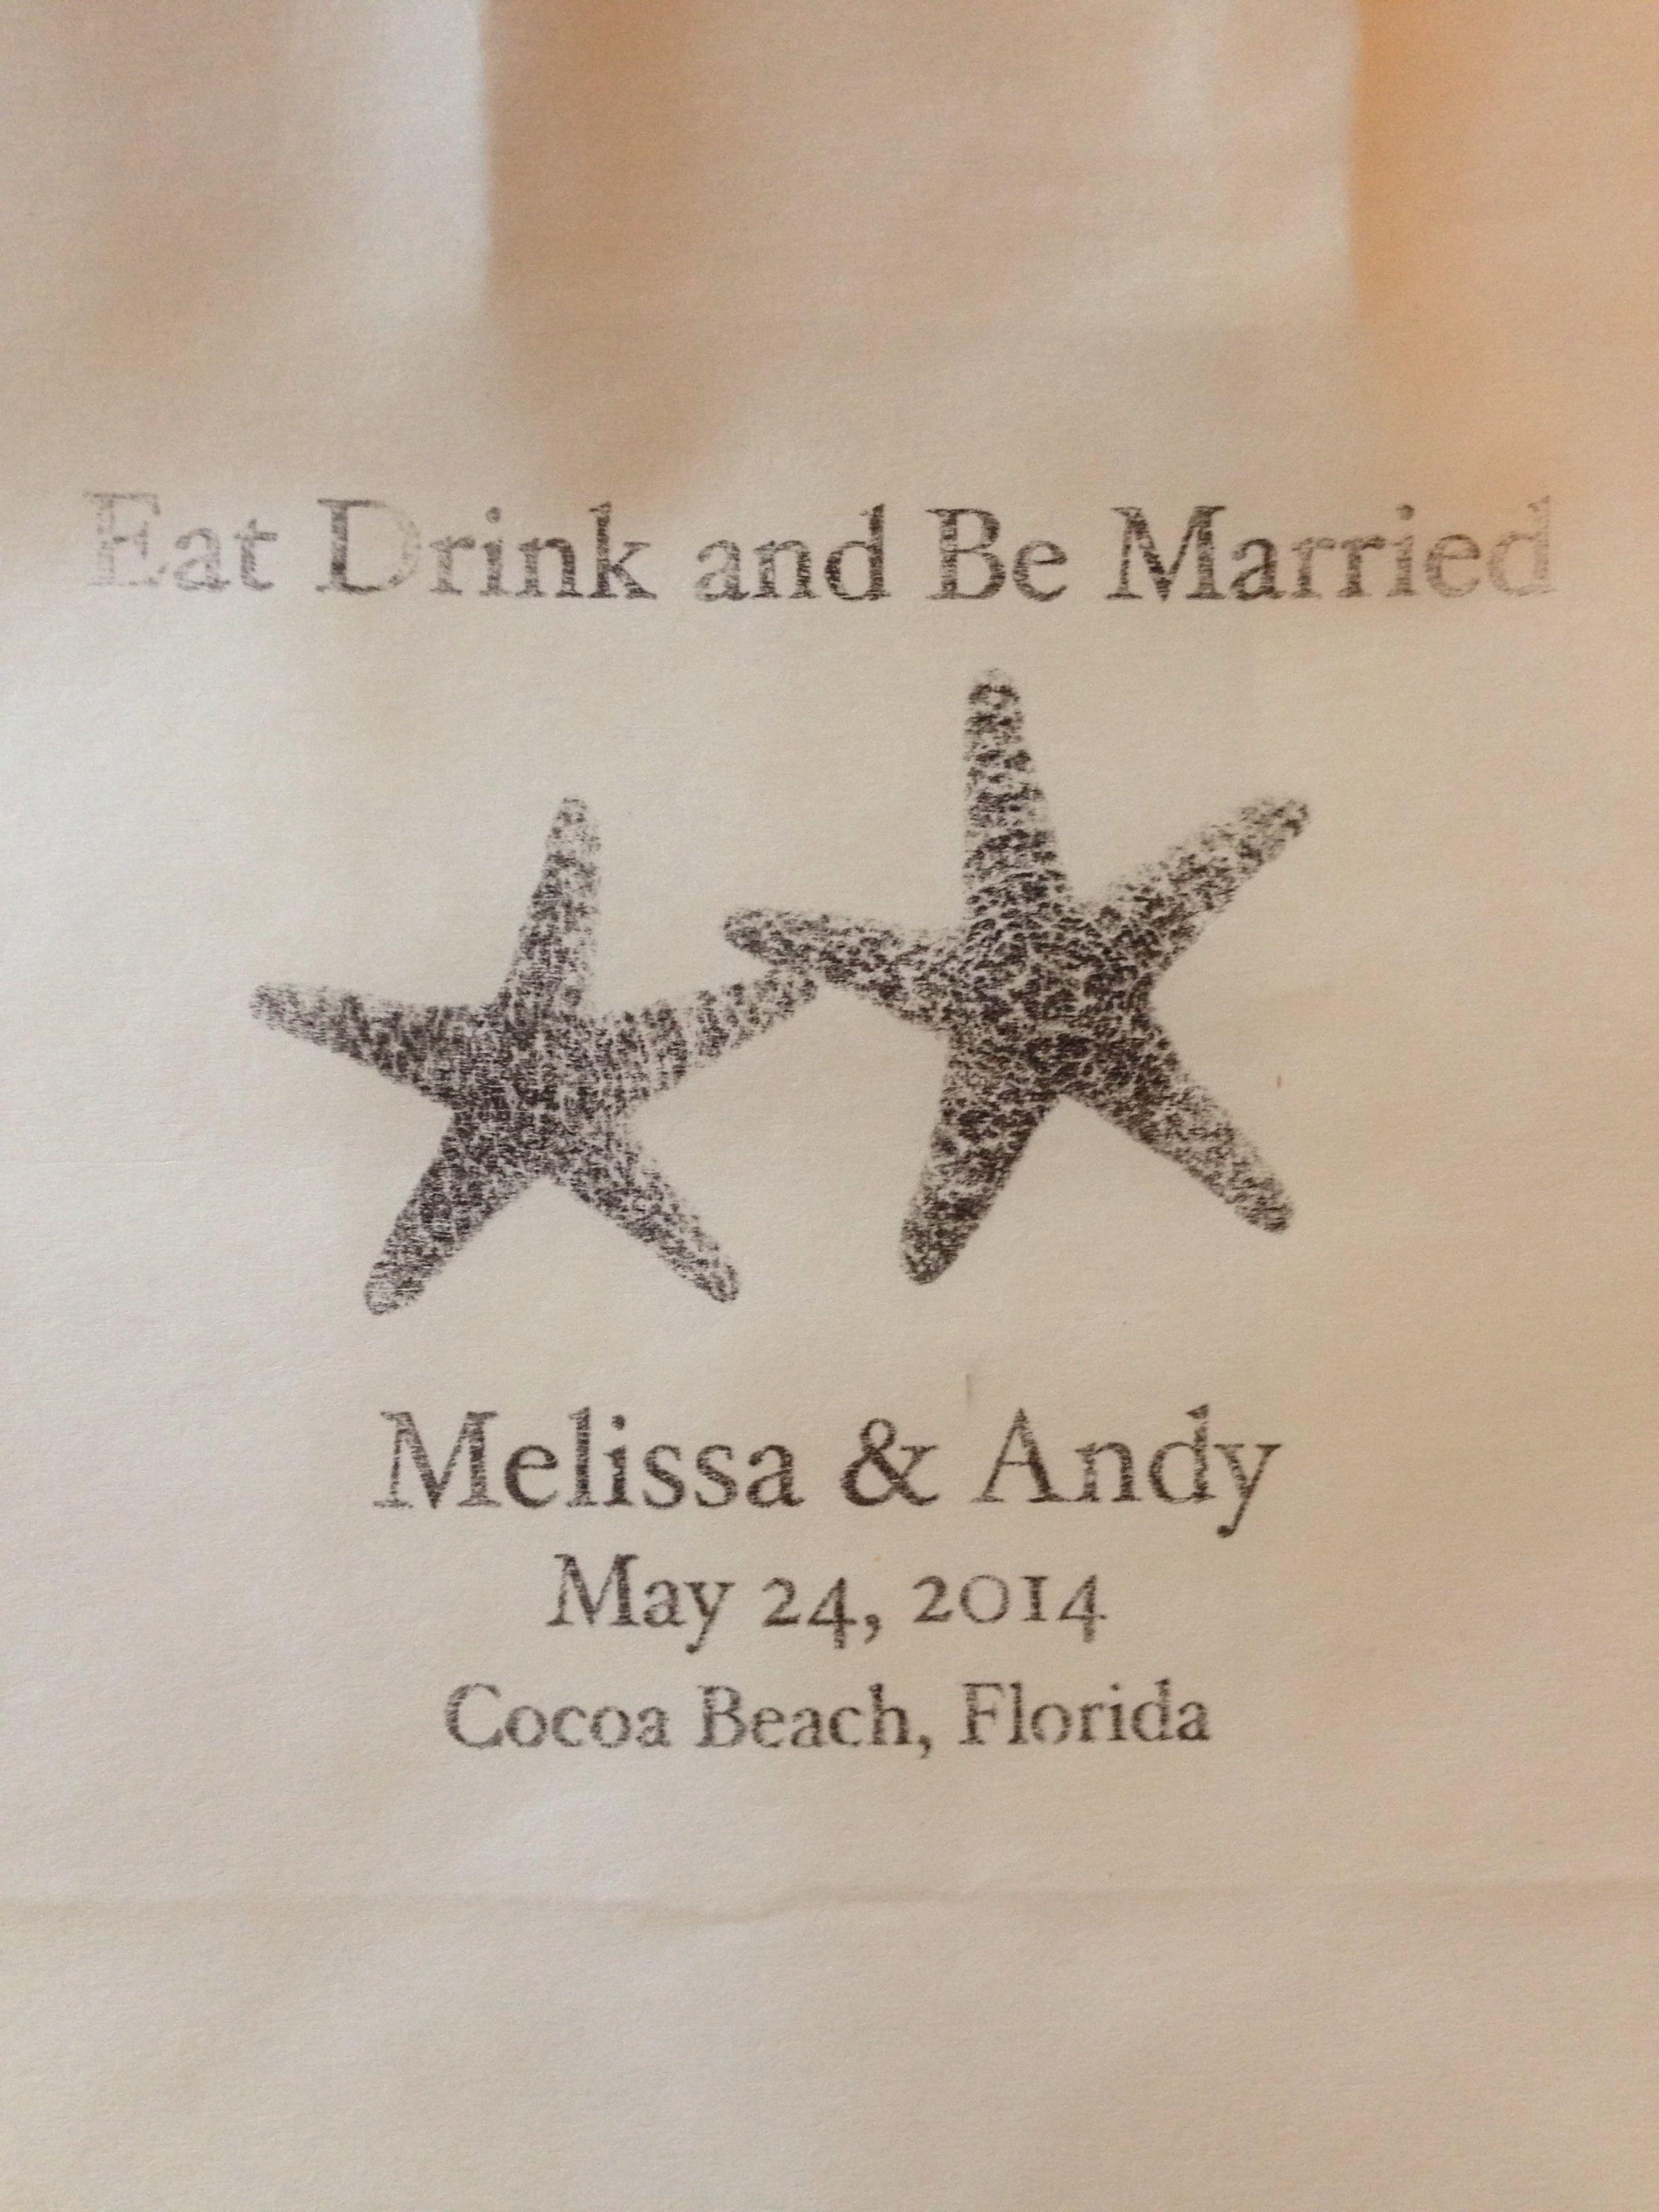 Contact me for your custom Wedding or Event bag request www.etsy.com/shop/wright4design #beachwedding #floridawedding #starfish #starfishwedding #paperbag #wedding #weddingbag #welcomebag #weddingfavor #weddingplanner #weddingphotographer #donotdisturb #etsy #diywedding #diyproject #diy #weddinggift #destinationwedding #hotelmotelholidayinn #pinterestwedding #etsywedding #pinterestwedding